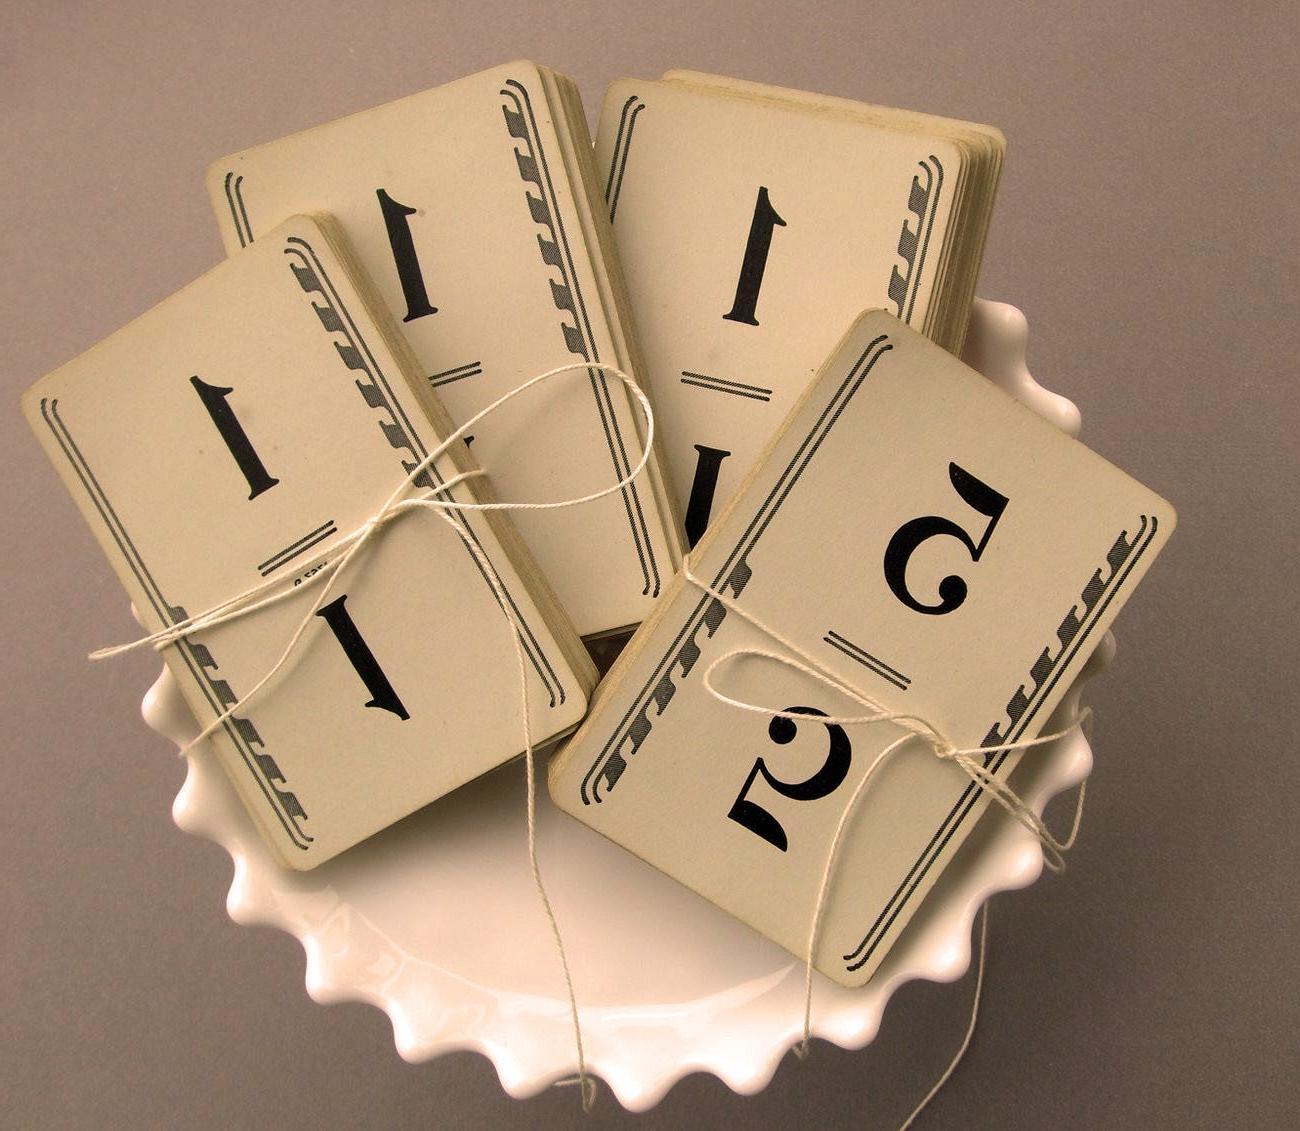 Fabulous 1950s VinTage WeDDinG TabLe NumBeRs- Vintage Number Cards,